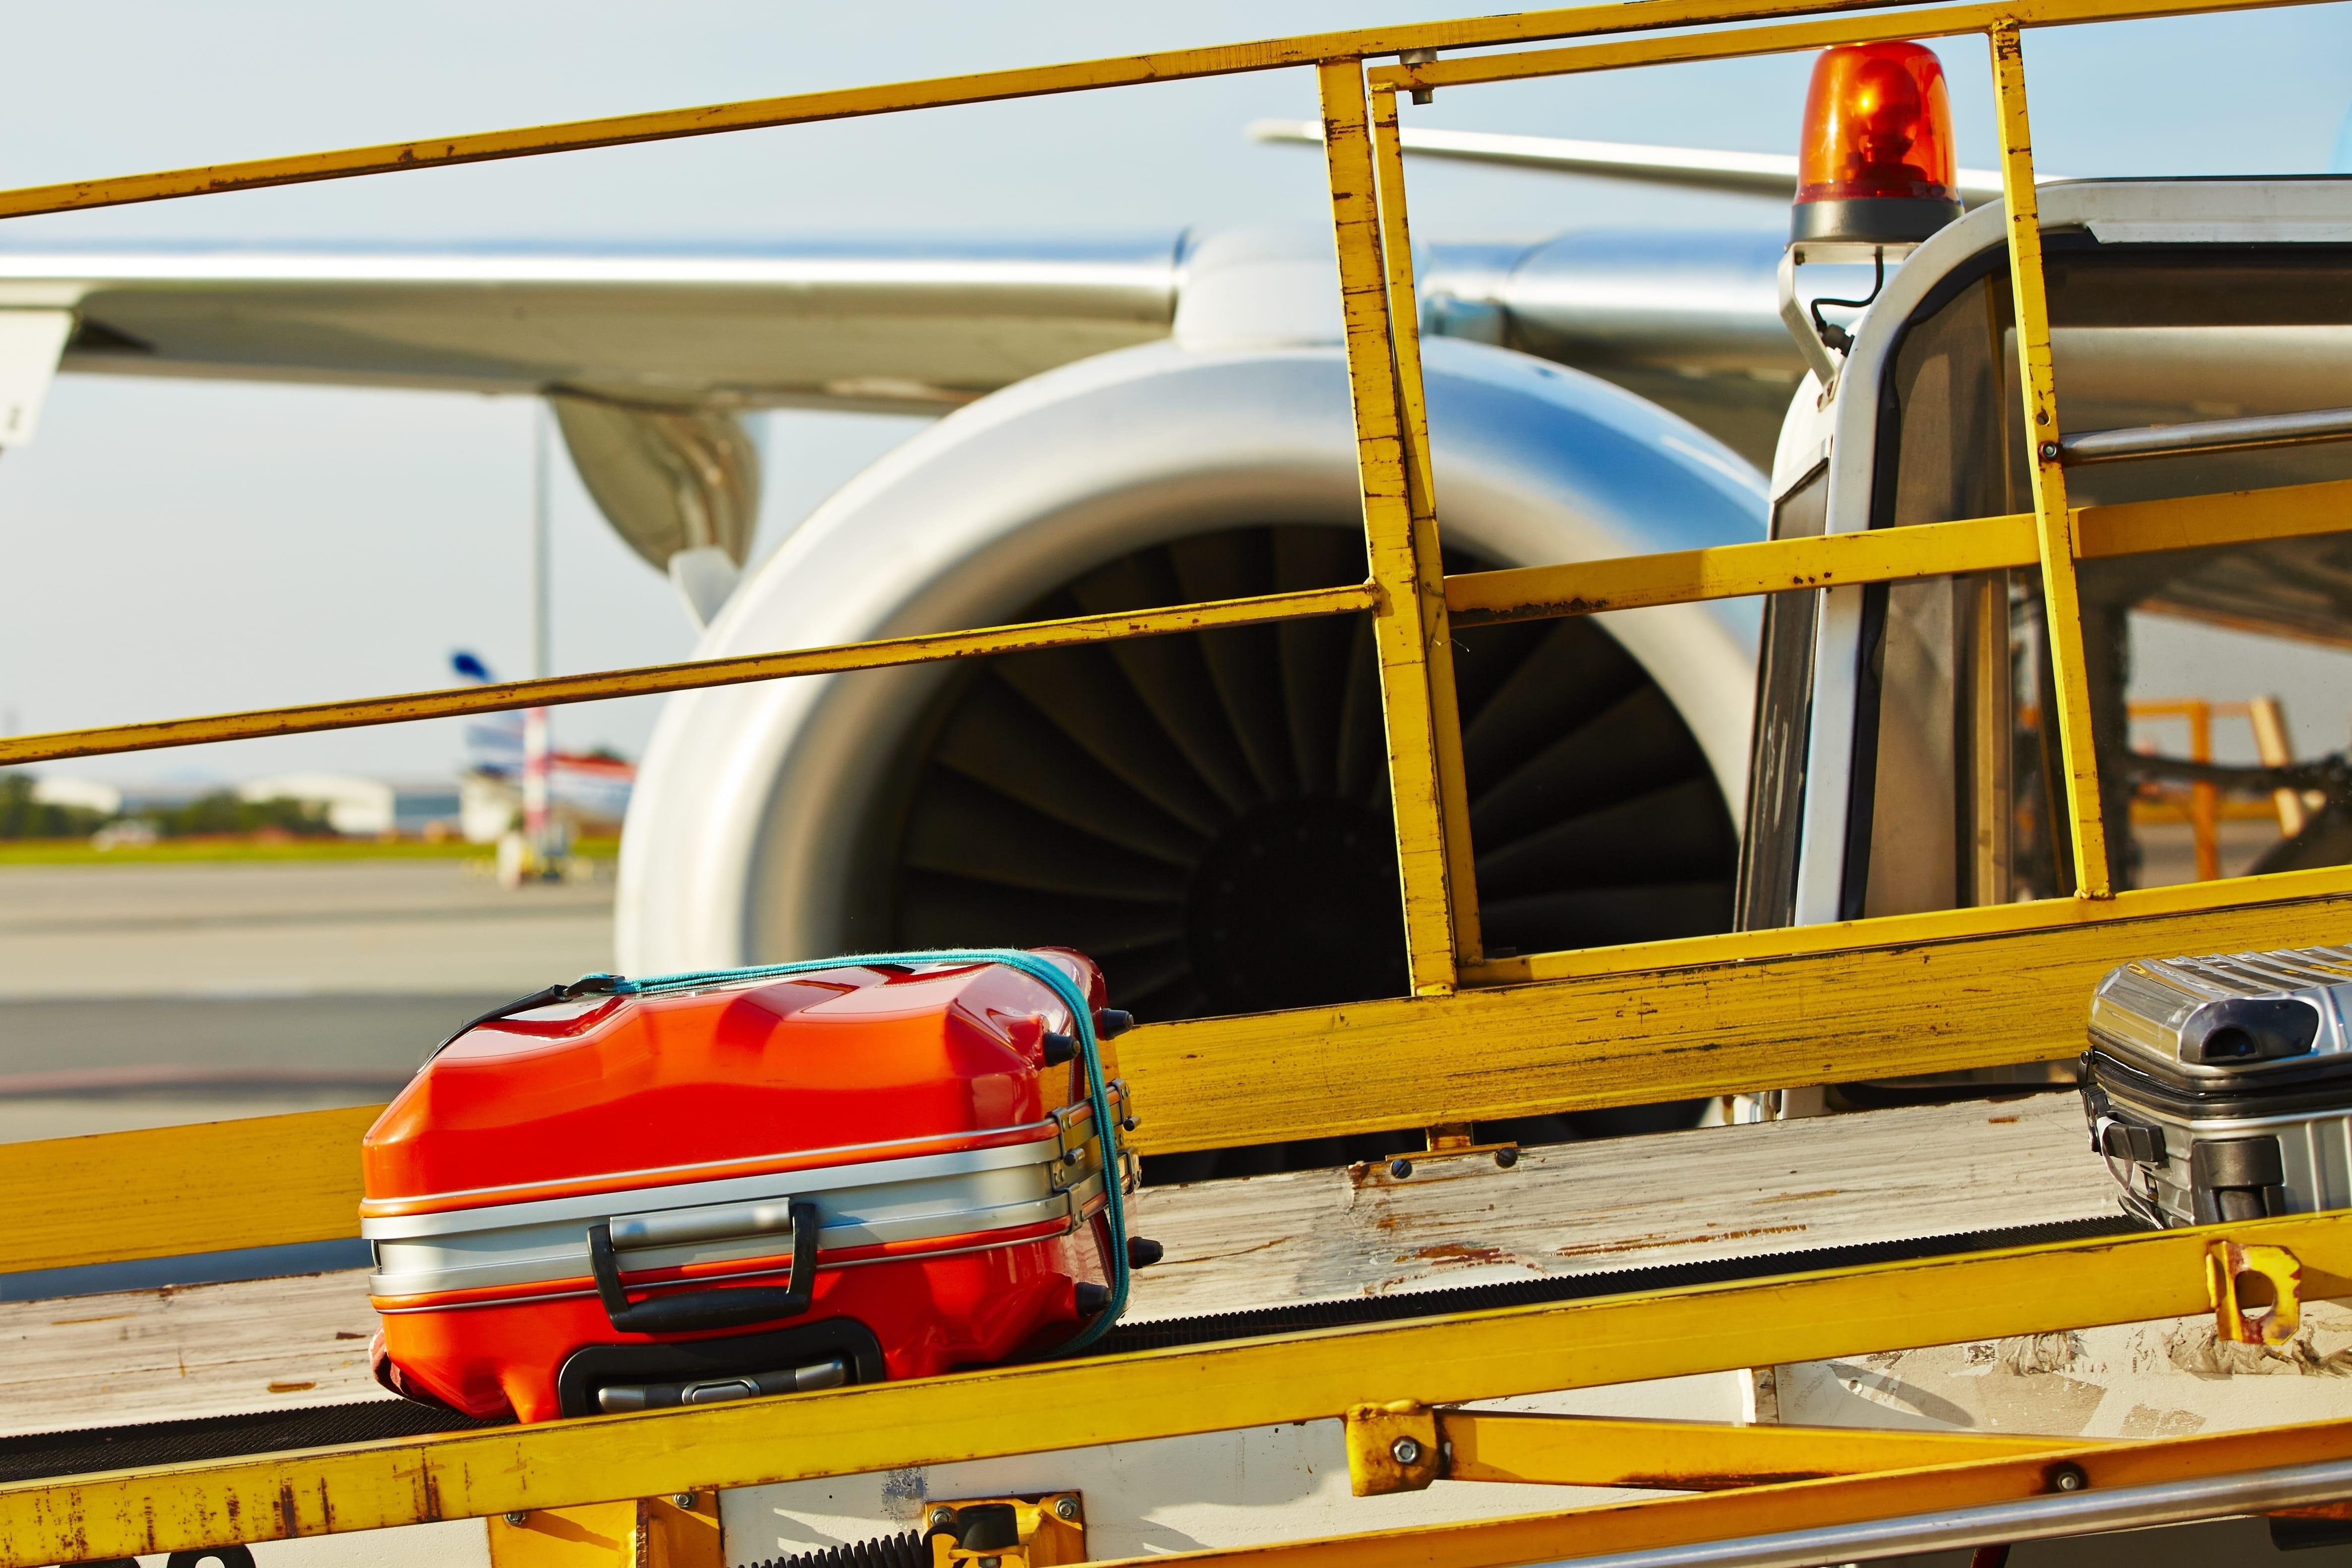 w22-3-Luggage conveyor belt